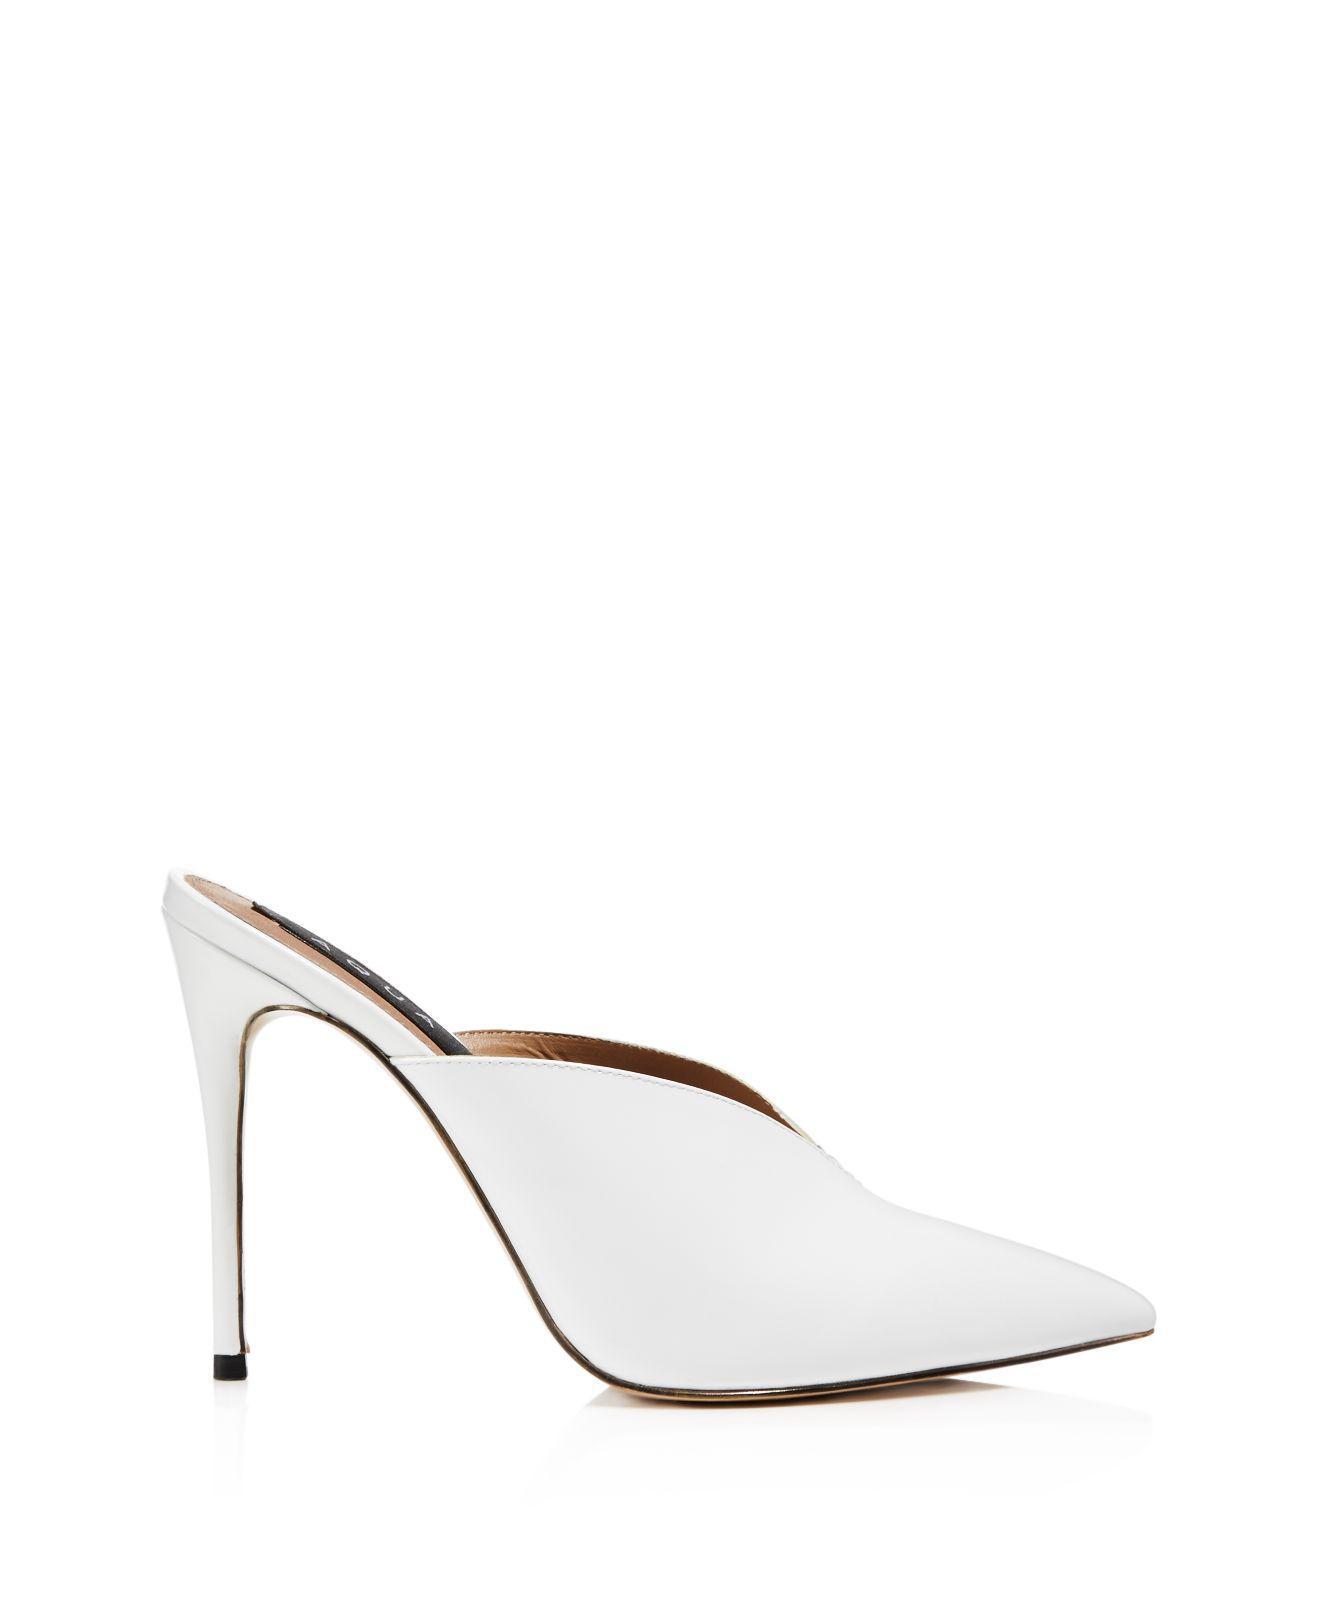 Aqua Women's Pointed Toe High-Heel Mules - 100% Exclusive 8wZsQB33r